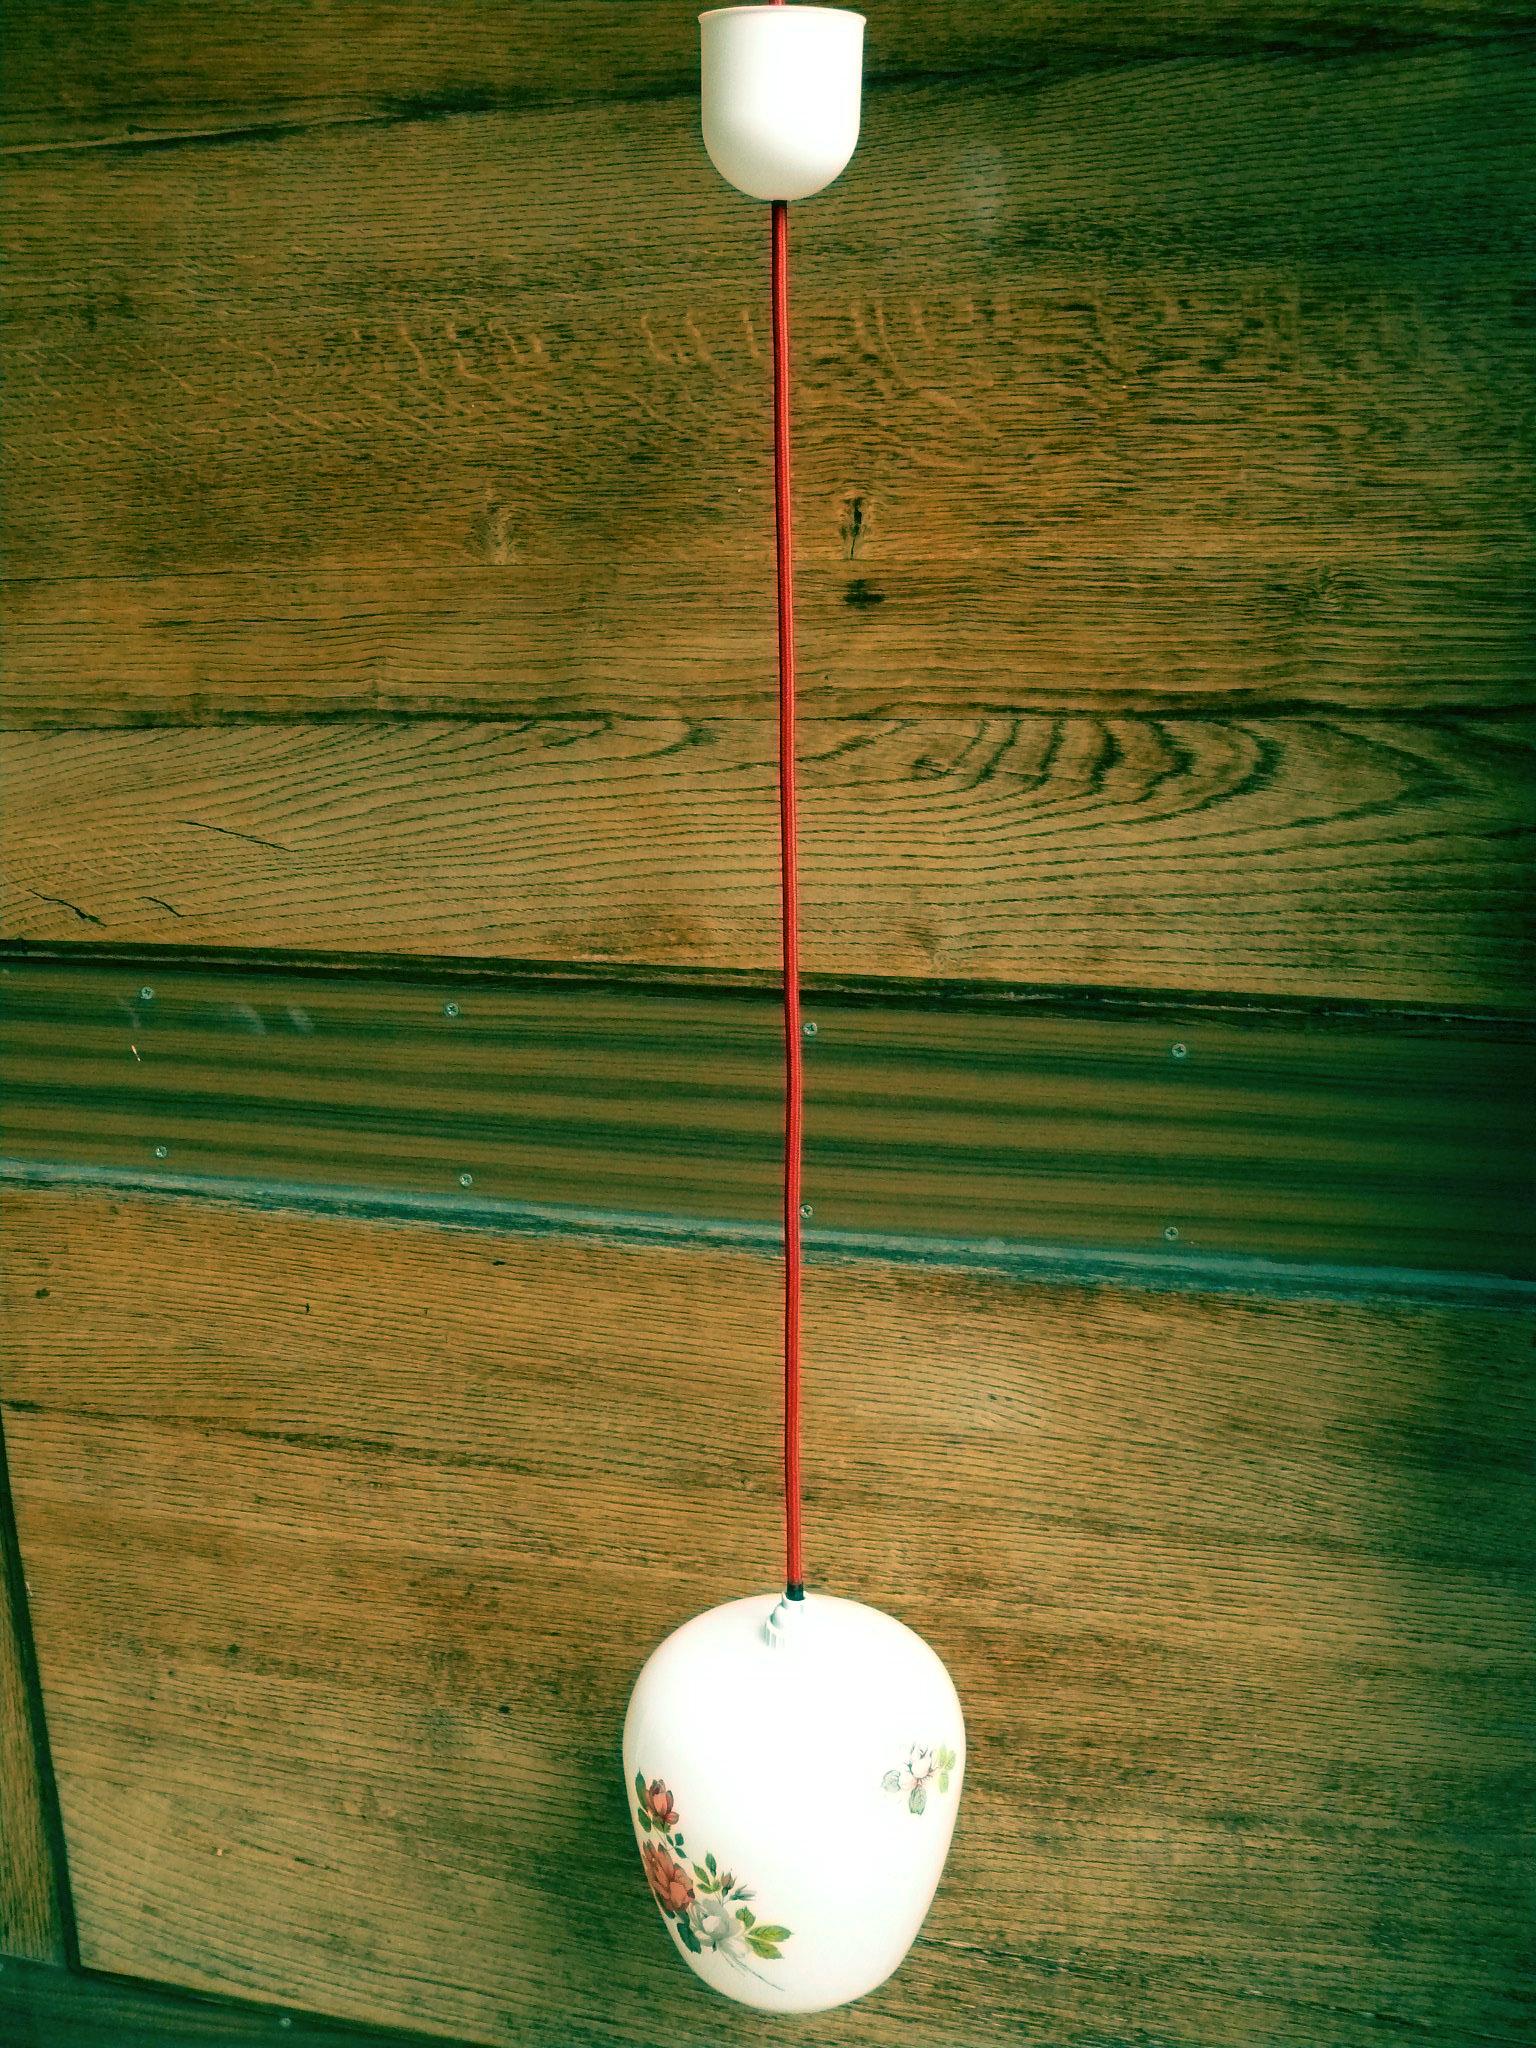 Suspension Cuisine Retro : Suspension opaline rétro adopte un meuble